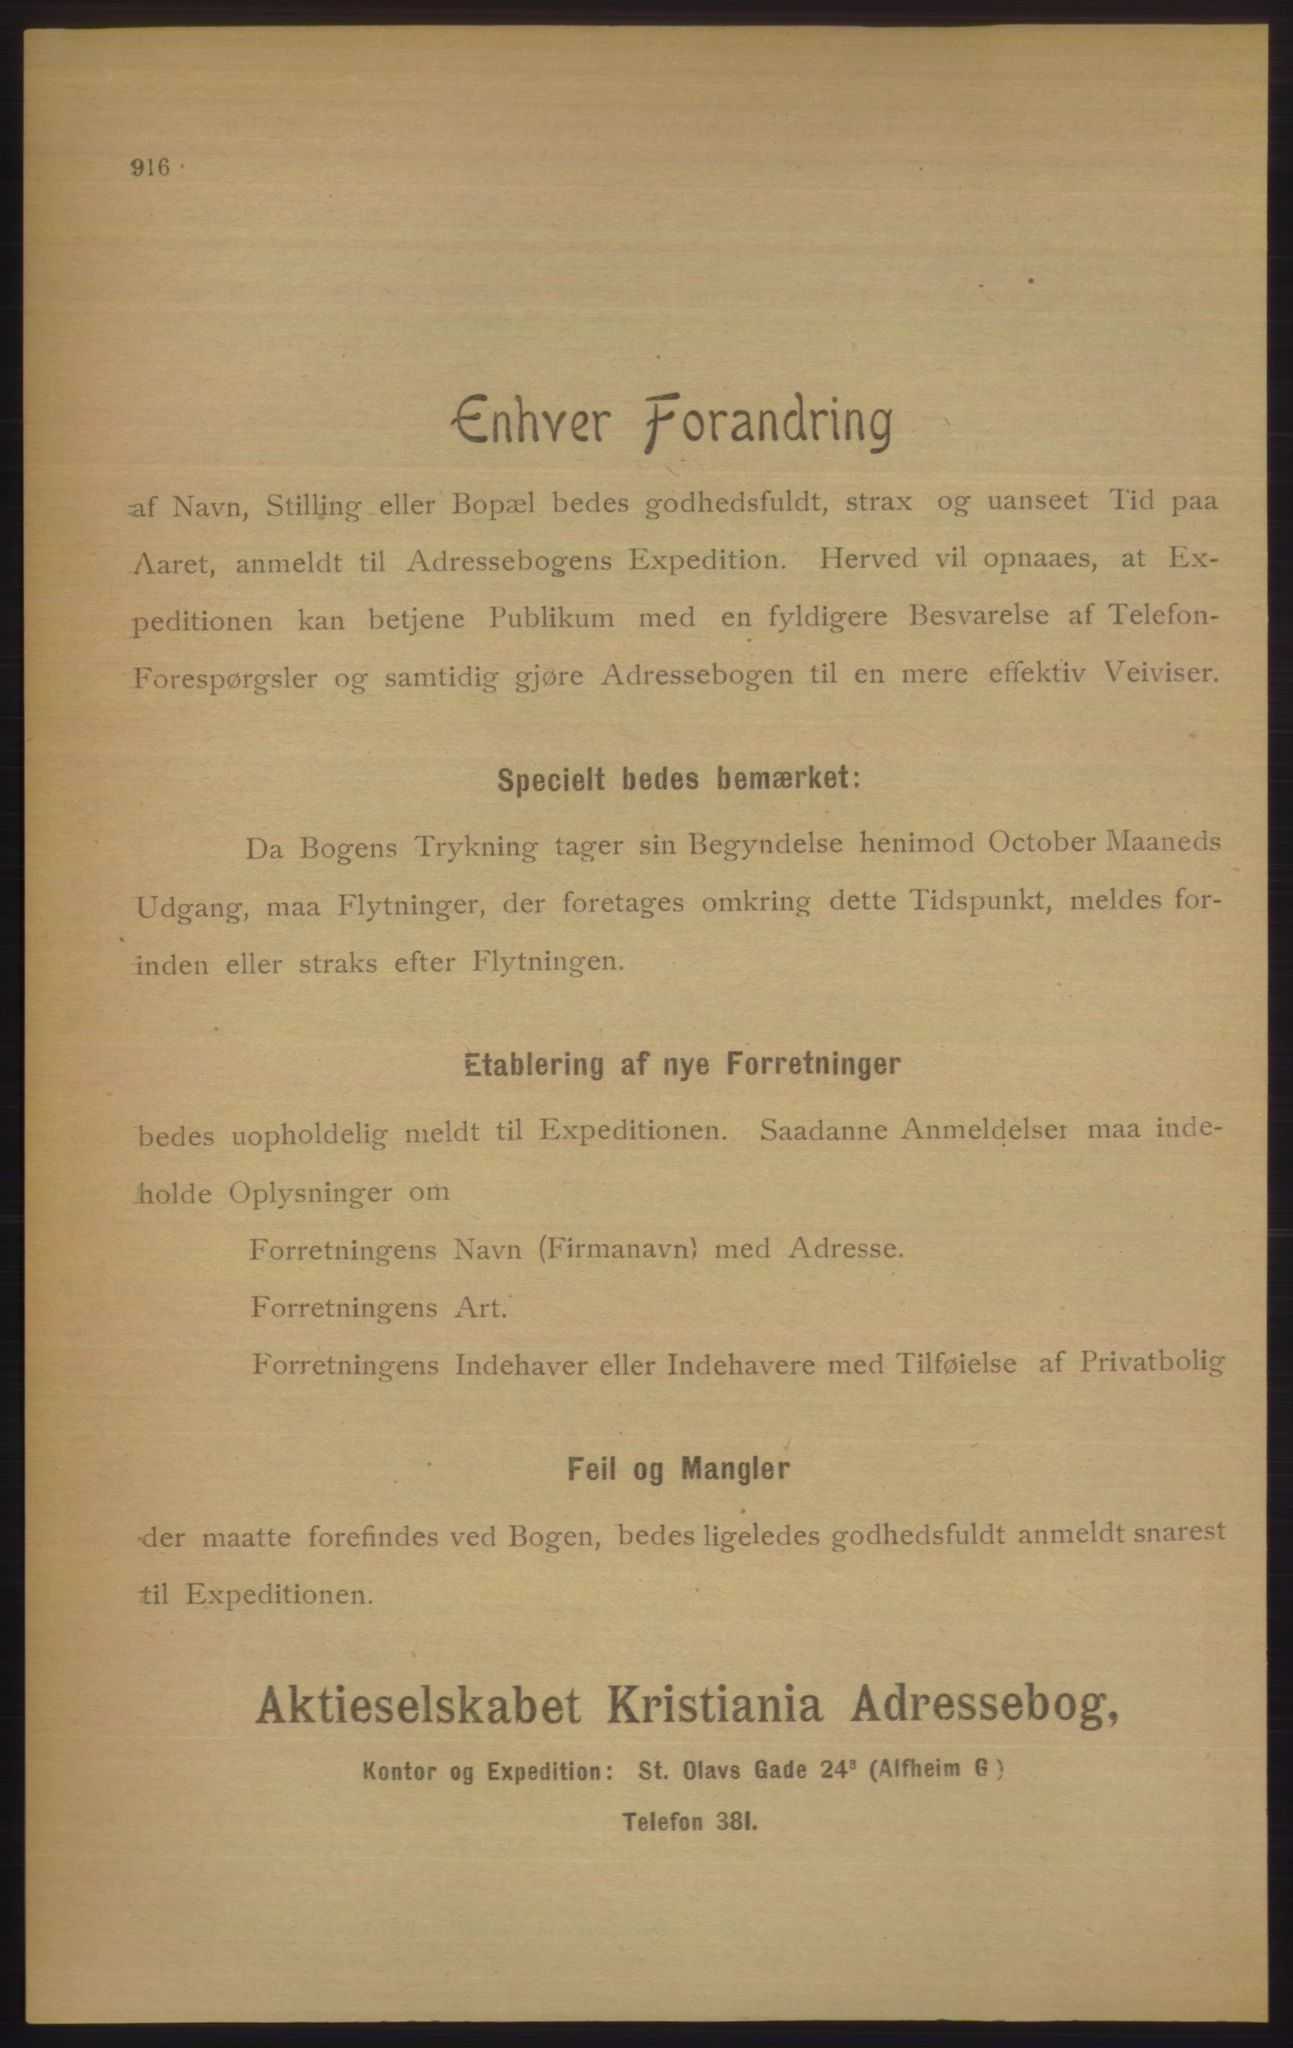 PUBL, Kristiania/Oslo adressebok, 1906, p. 916